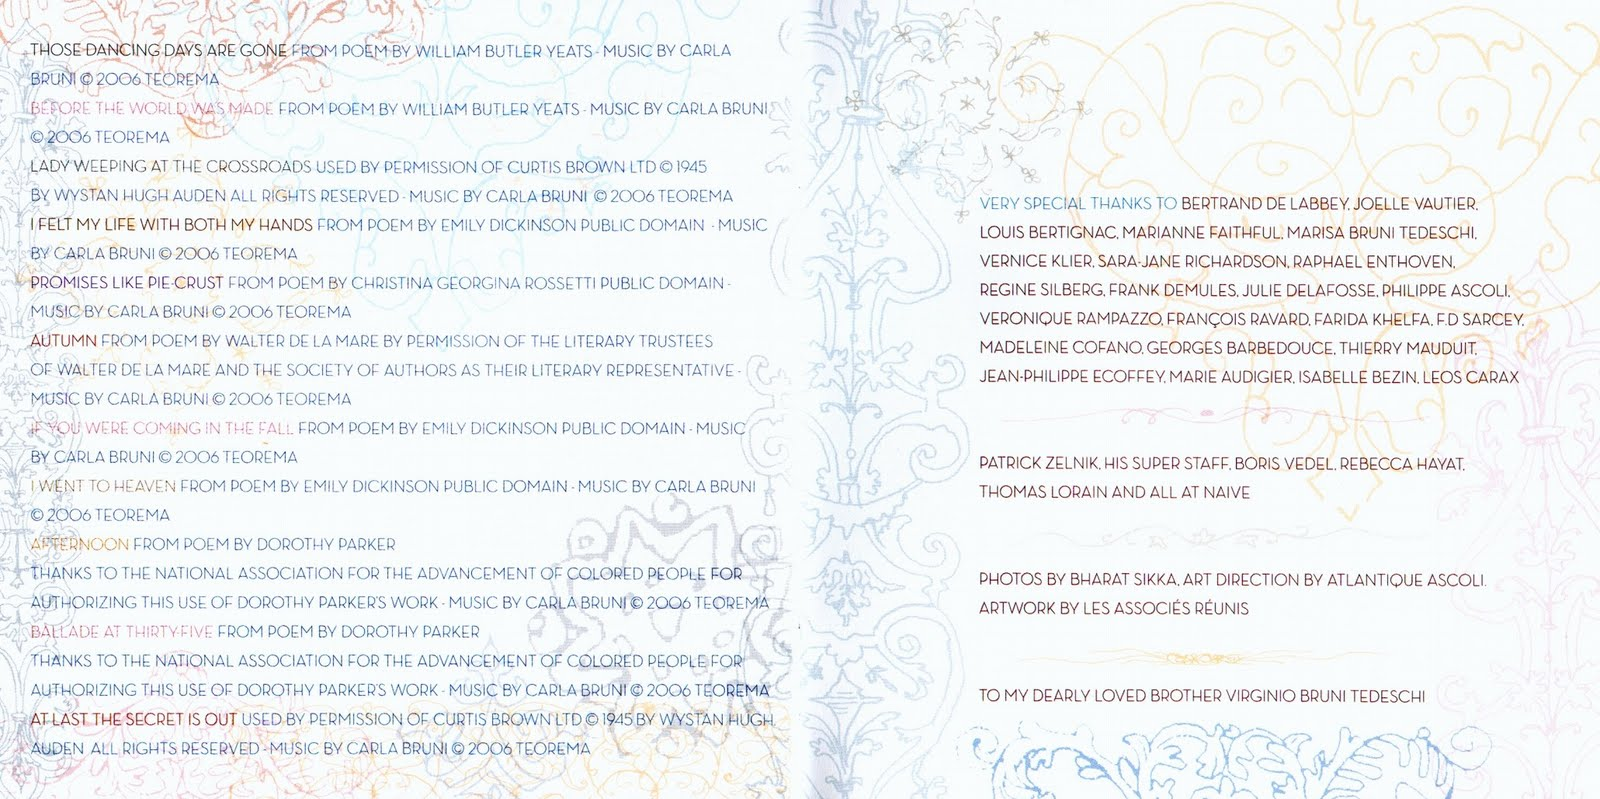 http://1.bp.blogspot.com/--QYeXXdOd3E/TjchCwvMrII/AAAAAAAAYA0/zlWvuNXFHRs/s1600/12.jpg